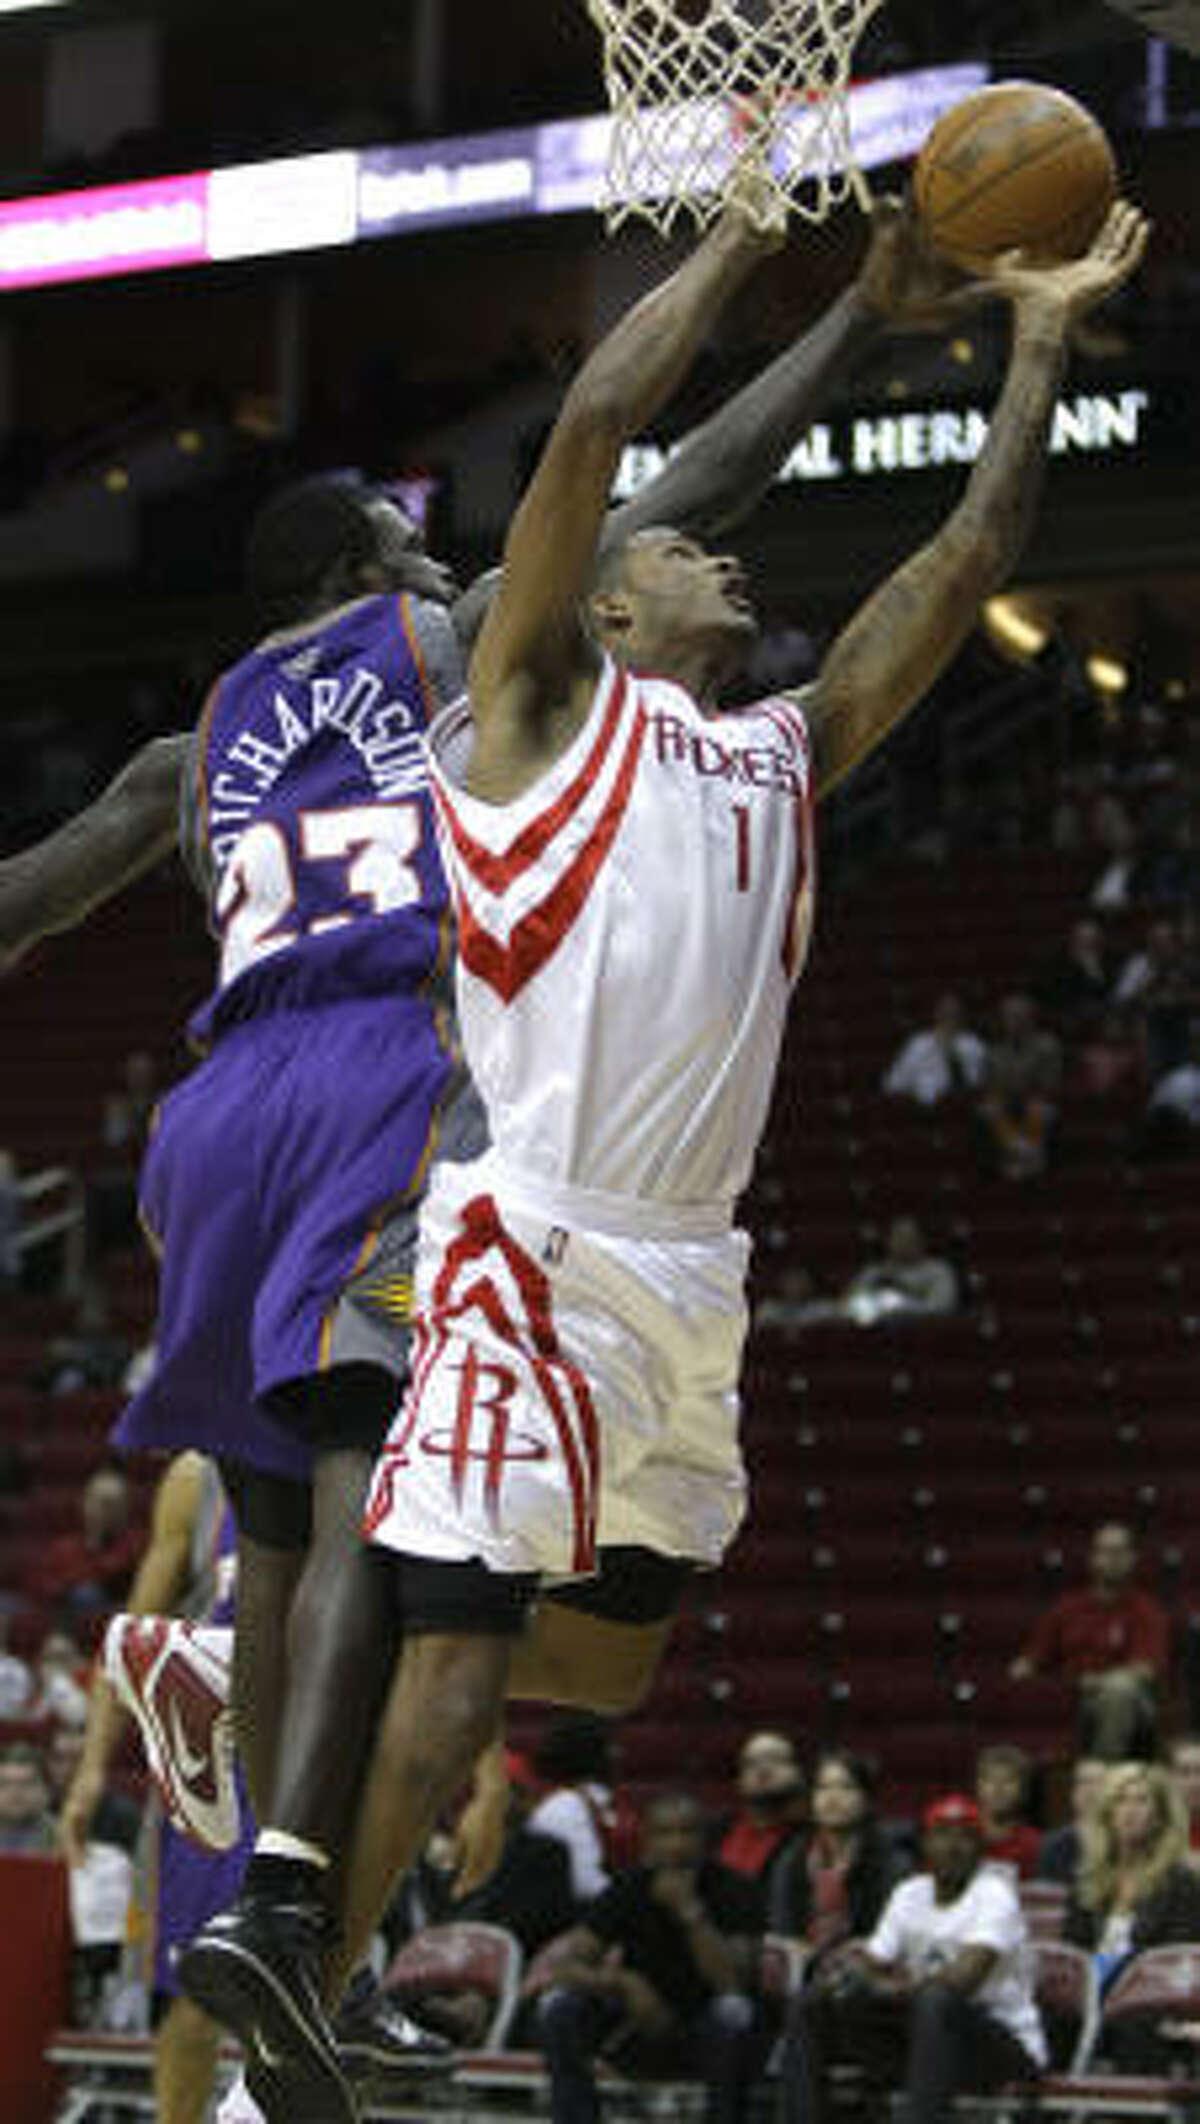 Suns guard Jason Richardson (23) blocks a shot put up by Rockets forward Trevor Ariza during the fourth quarter.